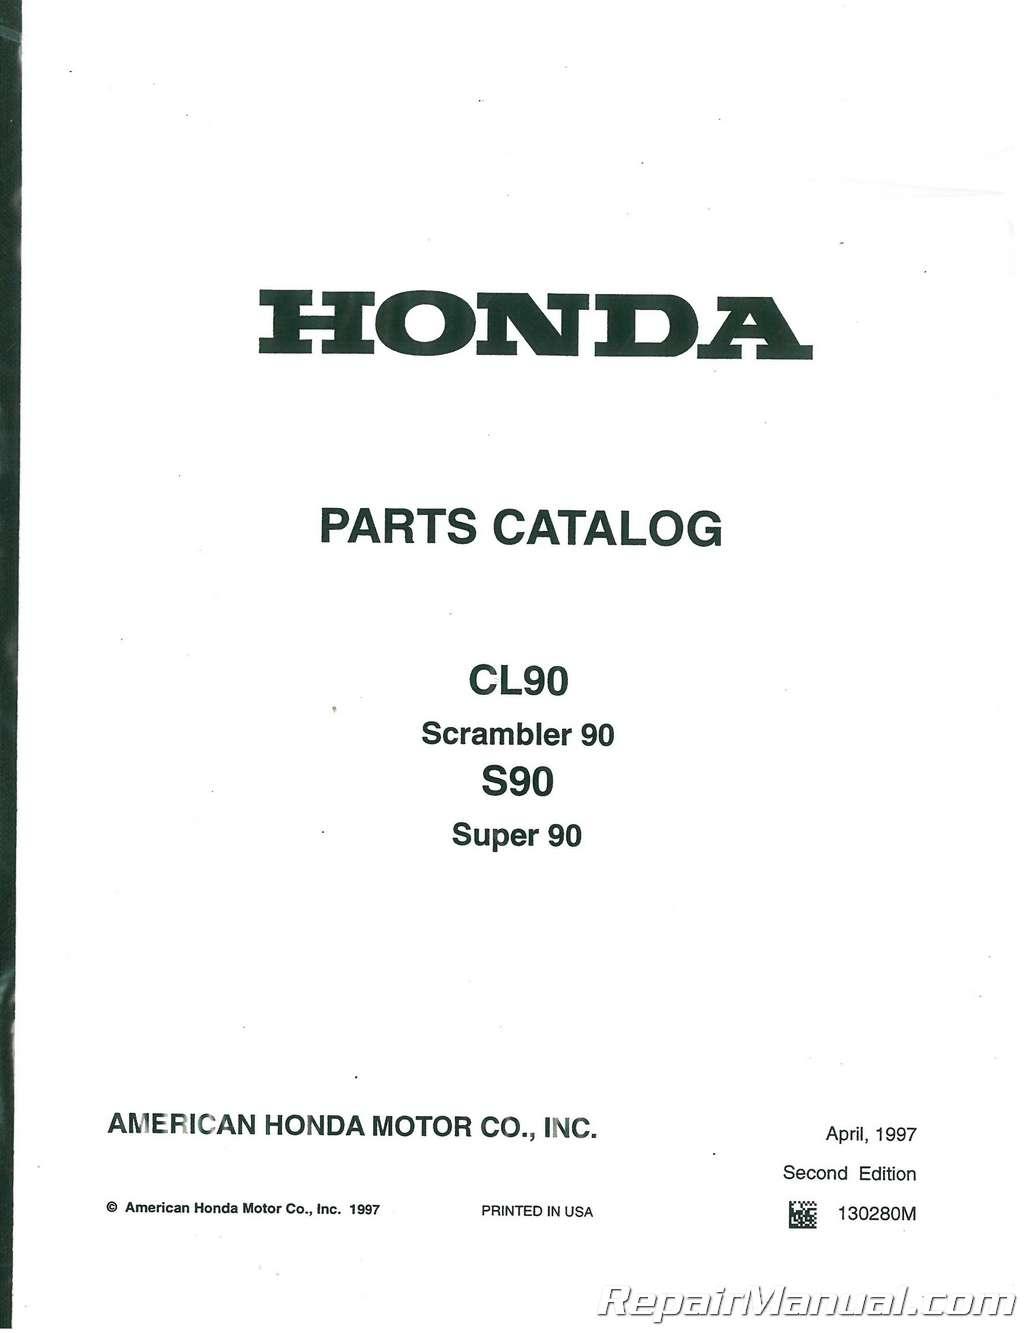 1964 1969 honda cl90 s90 motorcycle parts manual list rh repairmanual com  honda trail 90 parts breakdown